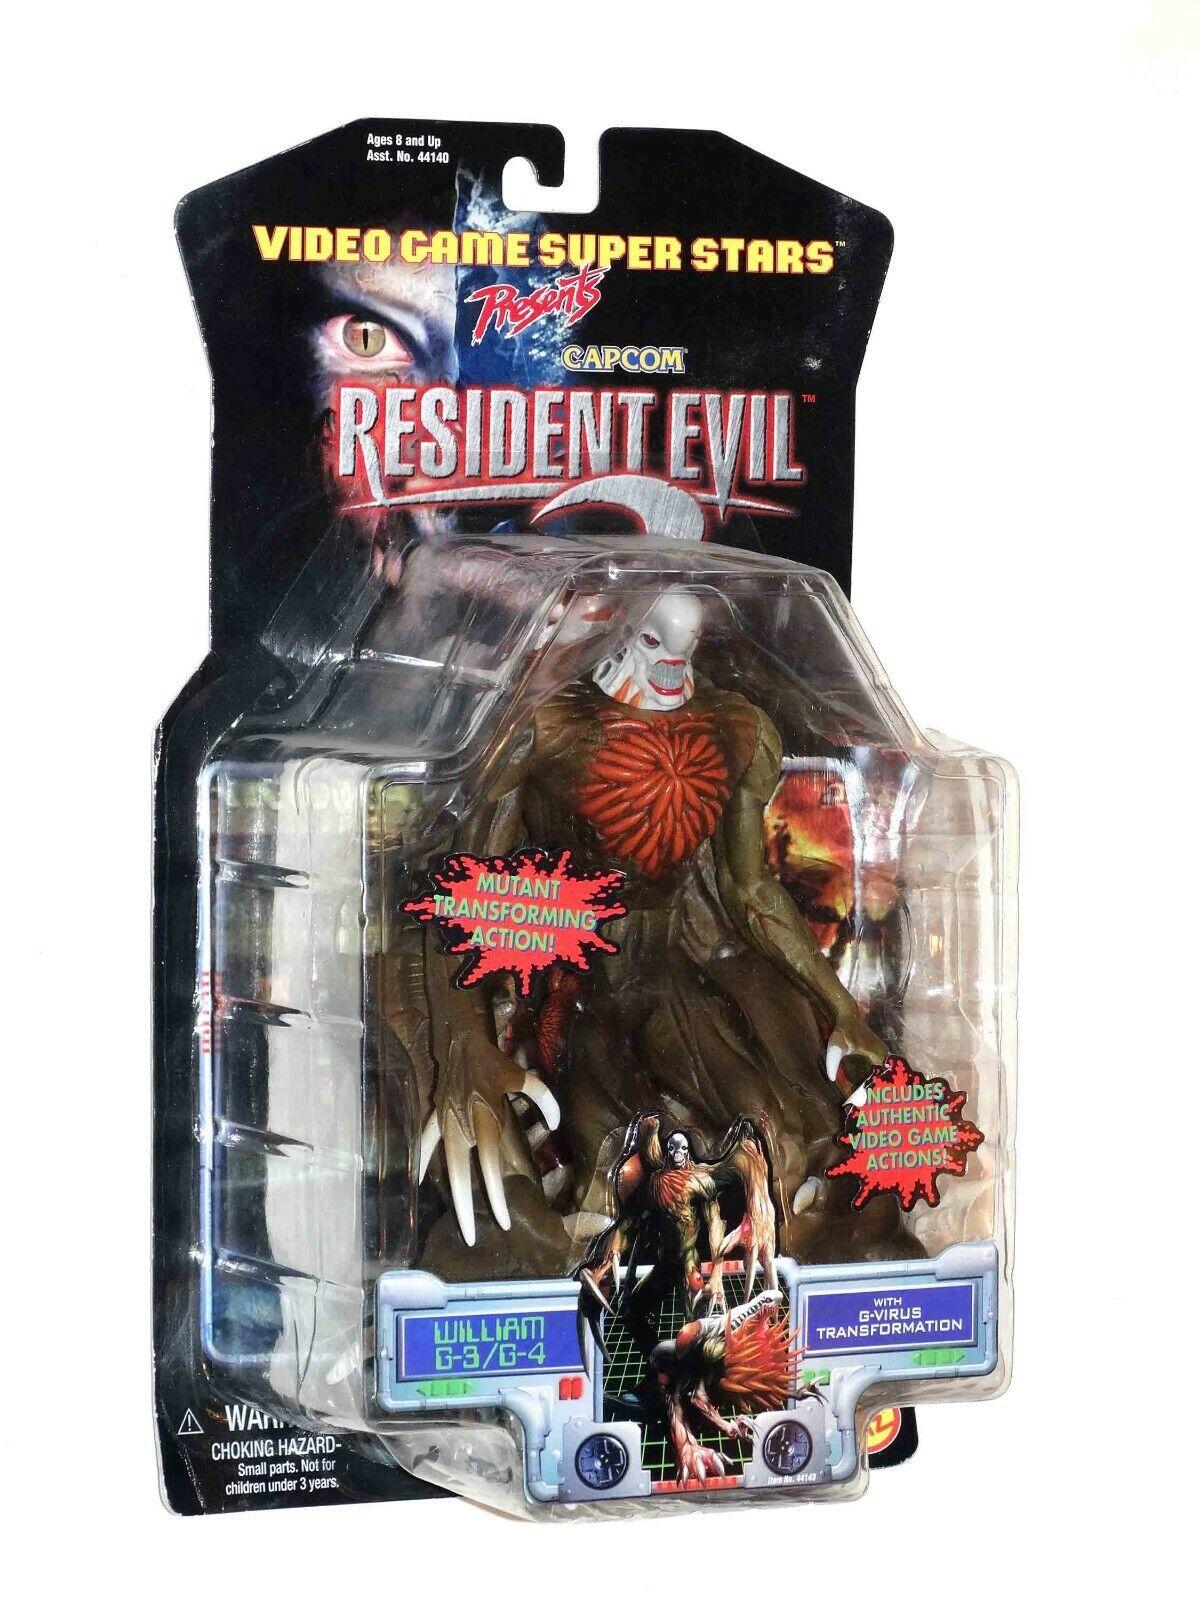 Resident Evil 2 William G-3 G-4 Action Figure Comme neuf on Card scellé 1998 Toy Biz CAPCOM